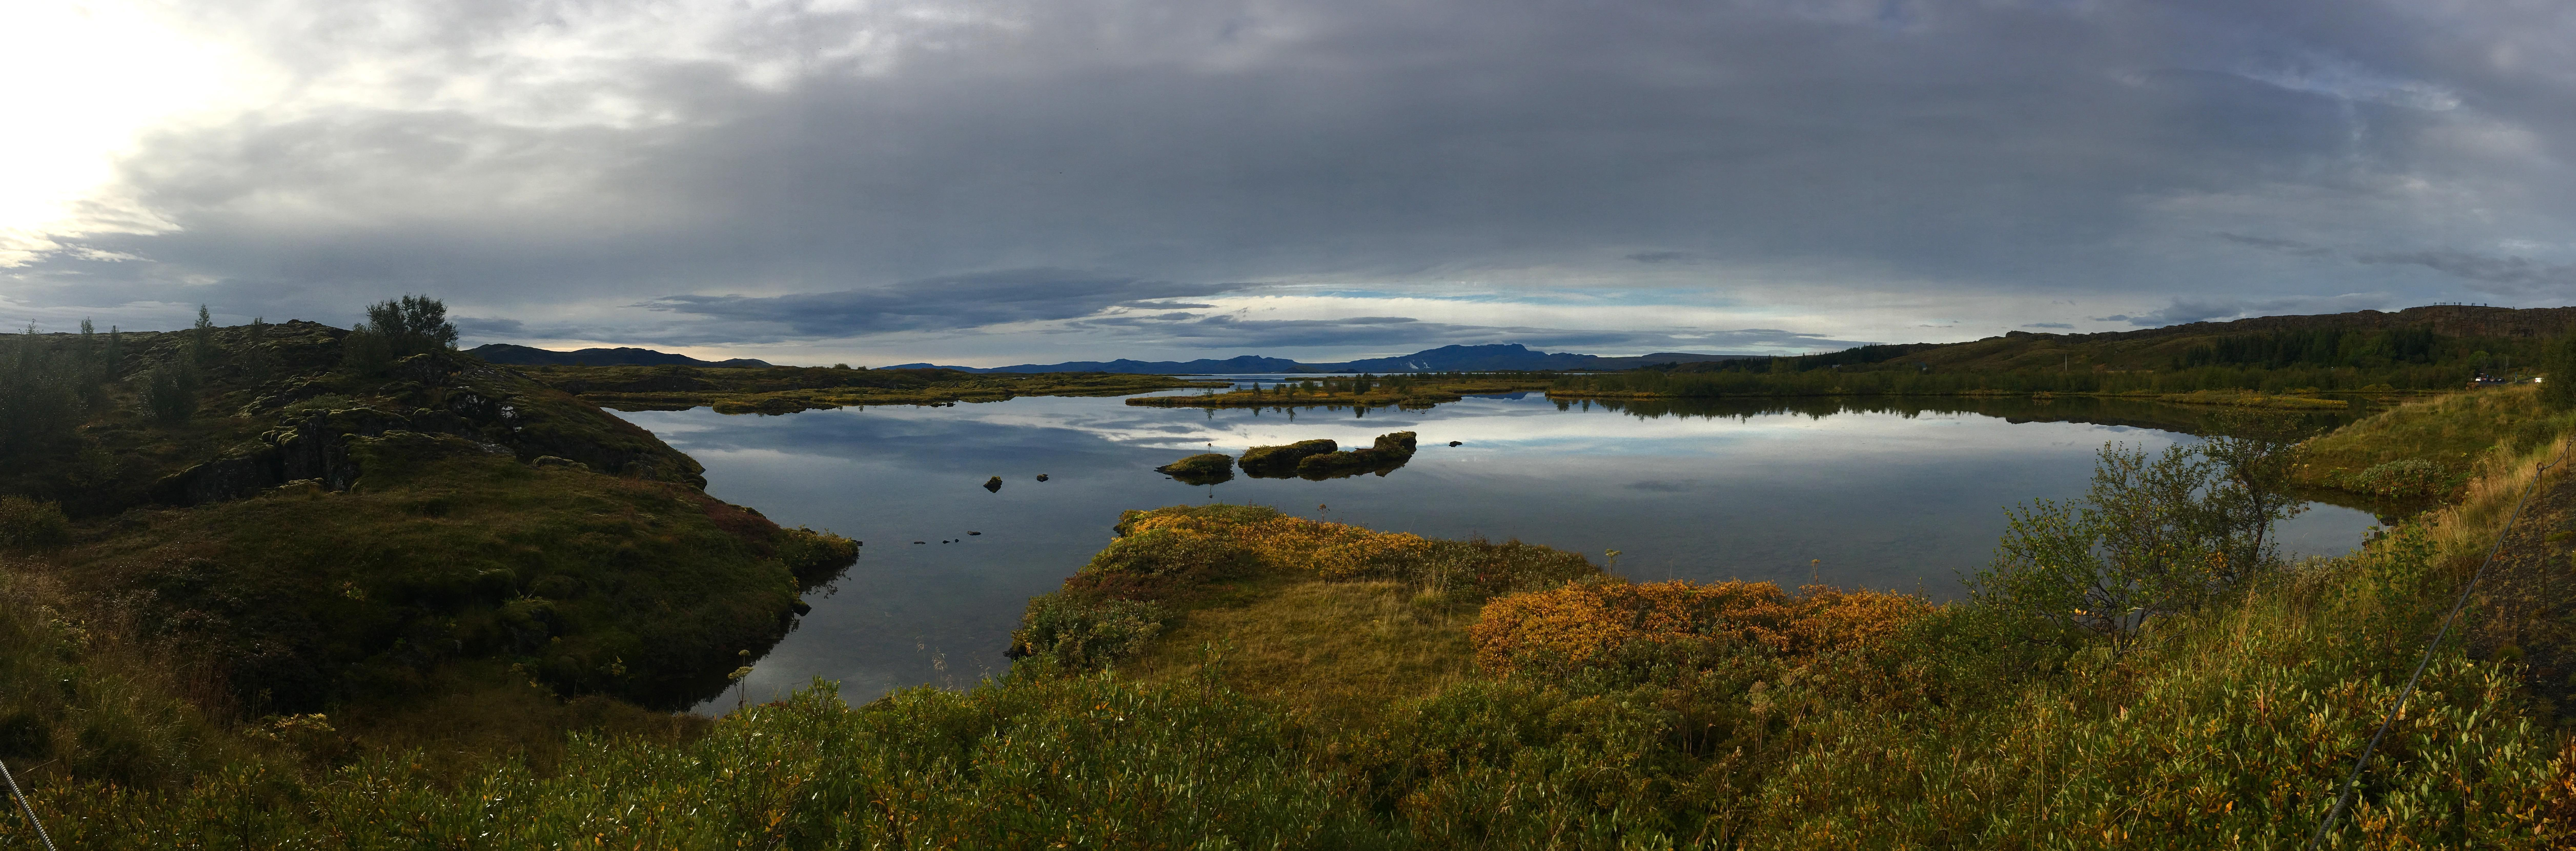 Walking from Þingvellir National Park parking P5 towards Silfra Fissure snorkel and scubadive site